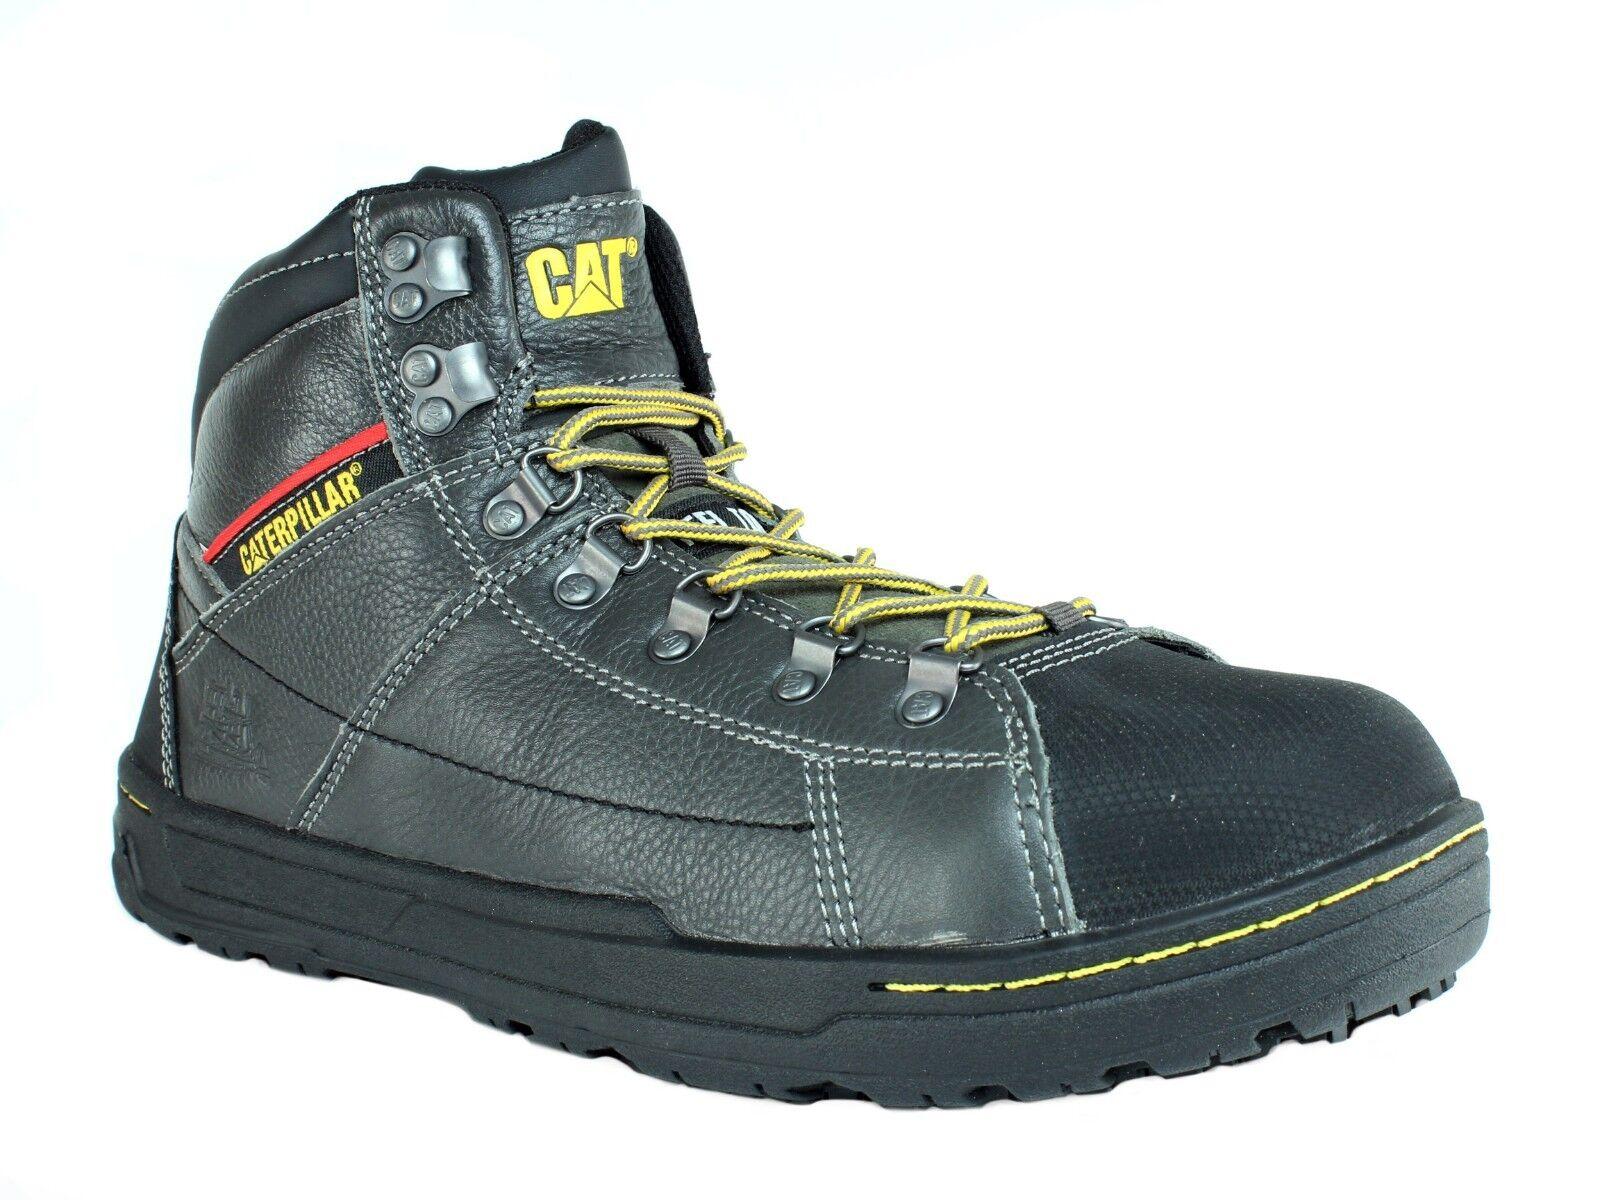 Caterpillar BRODE Hi SG Steel Toe Pour Homme Travail gris Chaussures Cuir Bottes